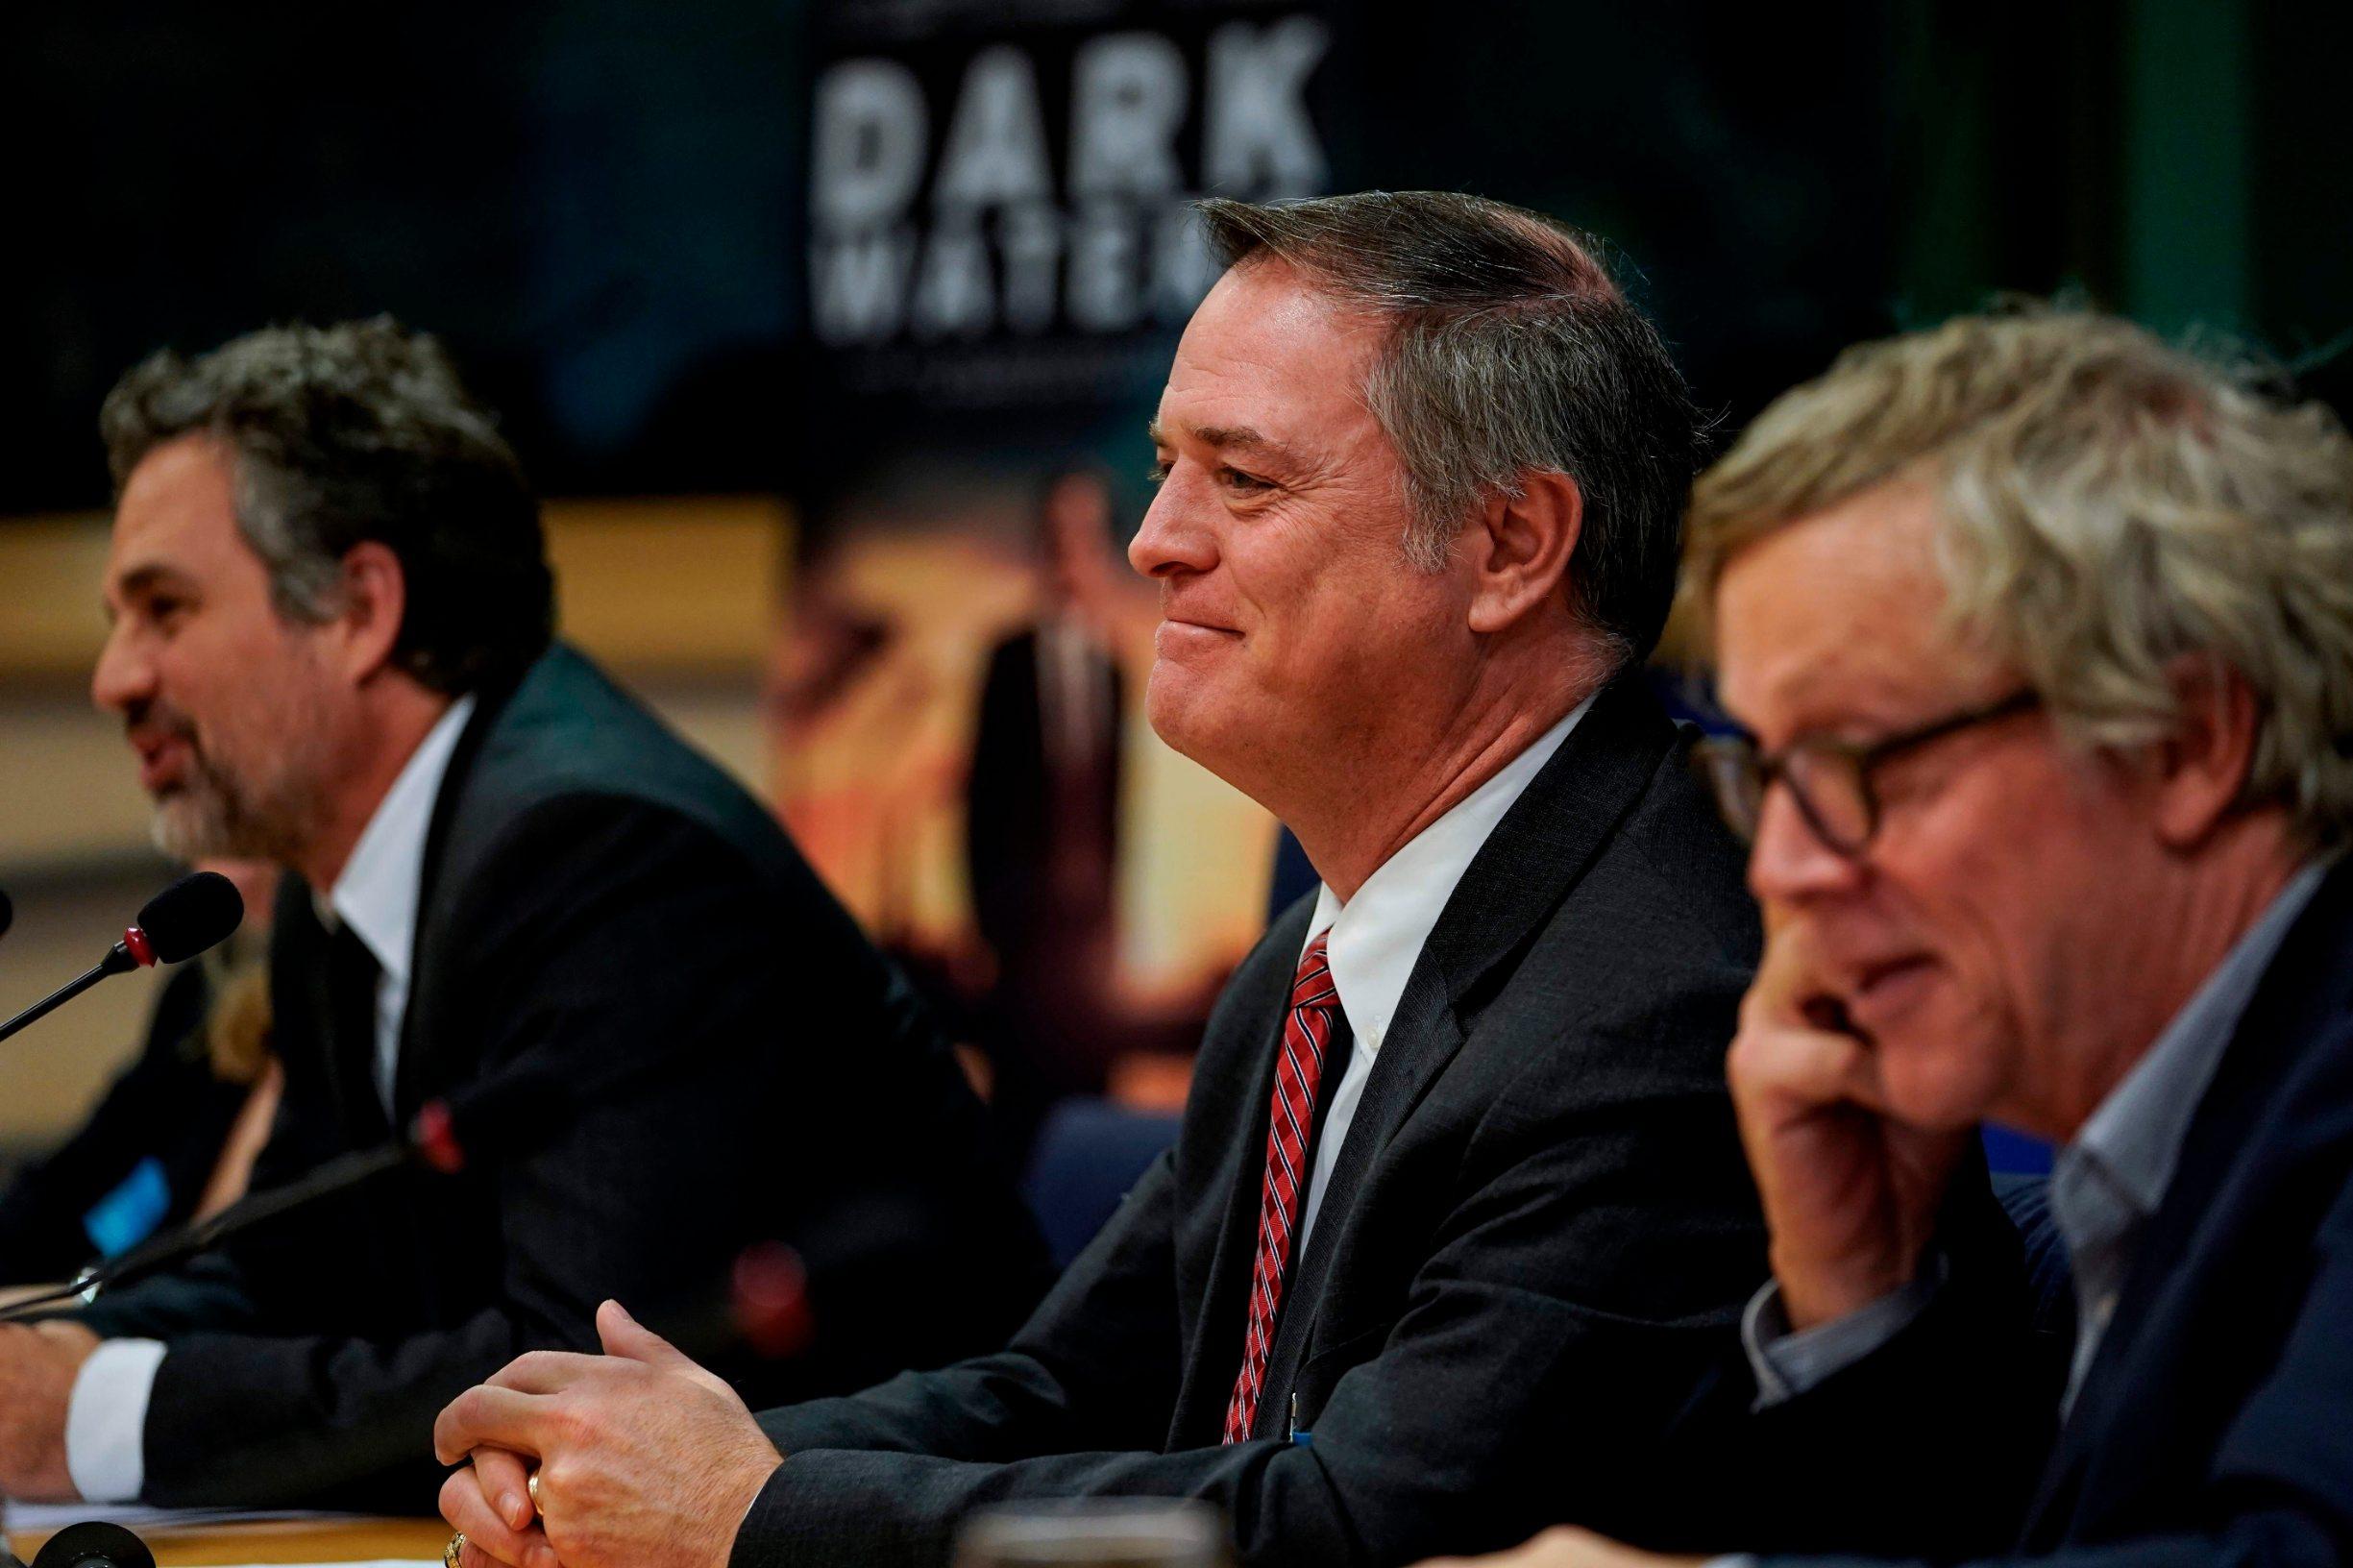 US lawyer Robert Bilott attends a European Parliament Committee's public hearing on February 5, 2020. (Photo by Kenzo TRIBOUILLARD / AFP)